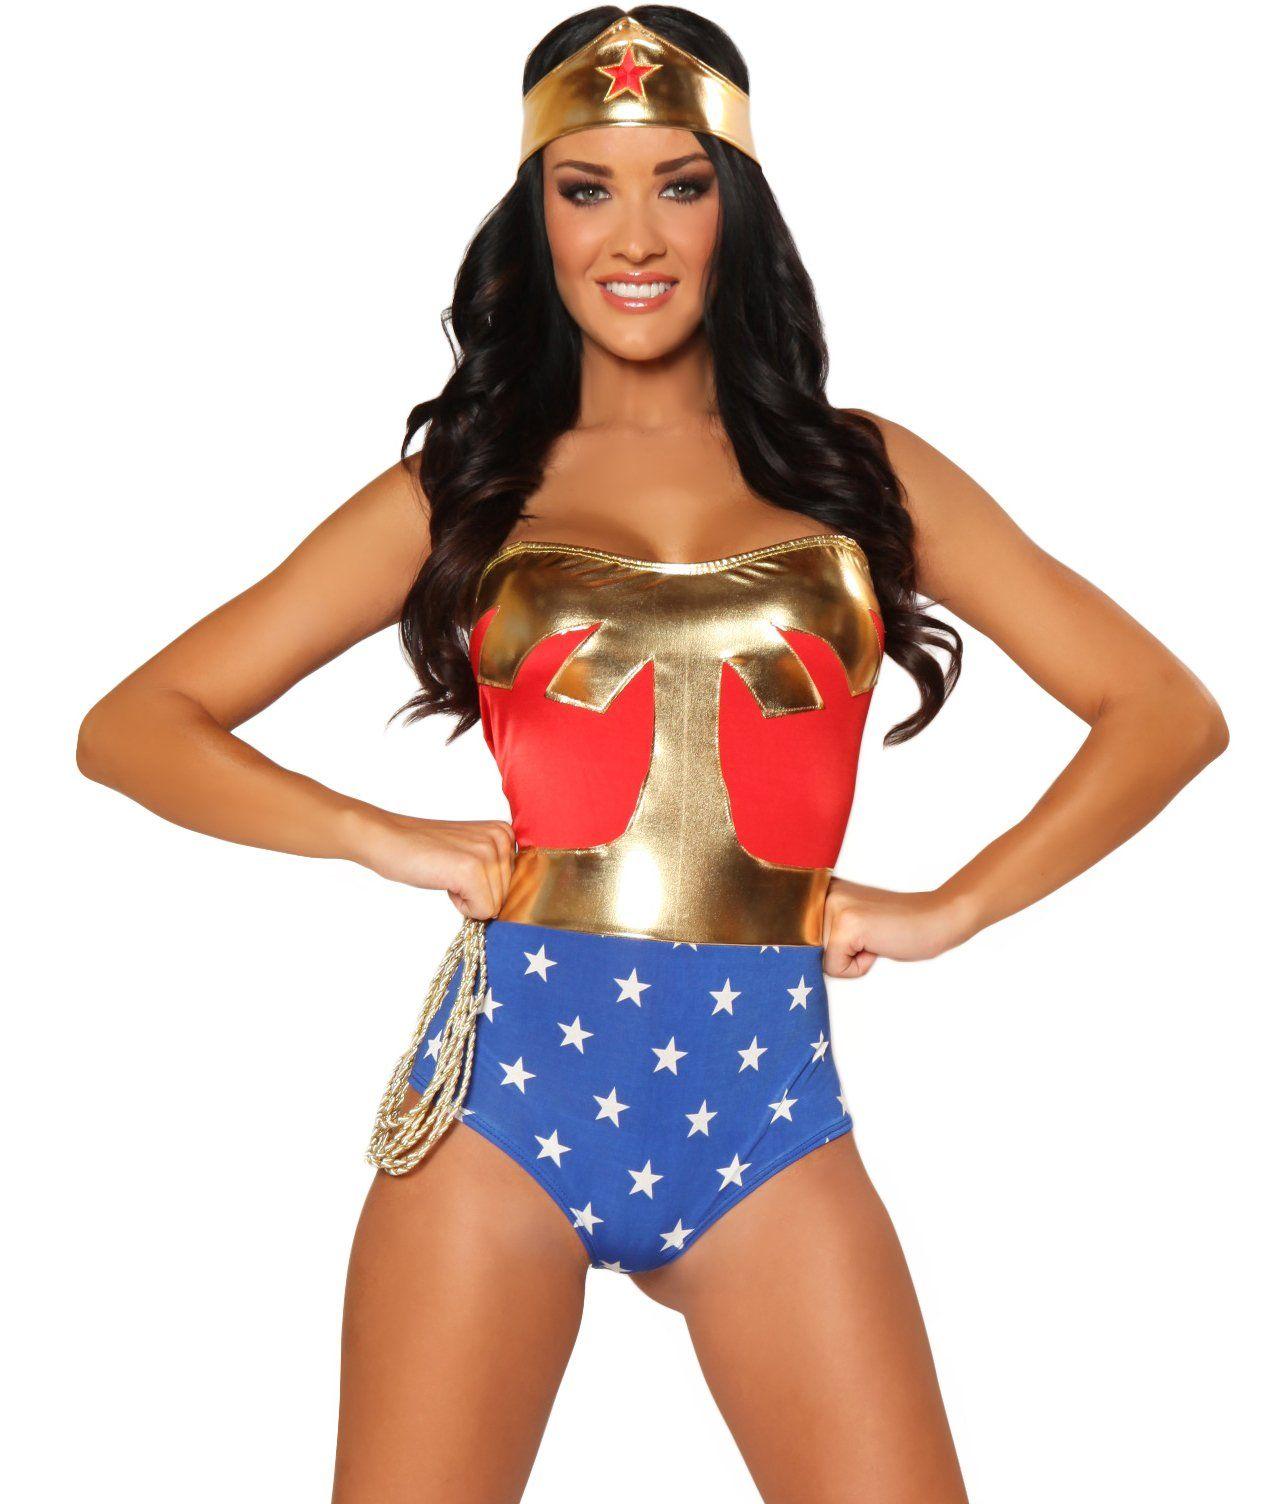 Amazon.com: 3WISHES 'American Hero Costume' Sexy Superhero Costume ...